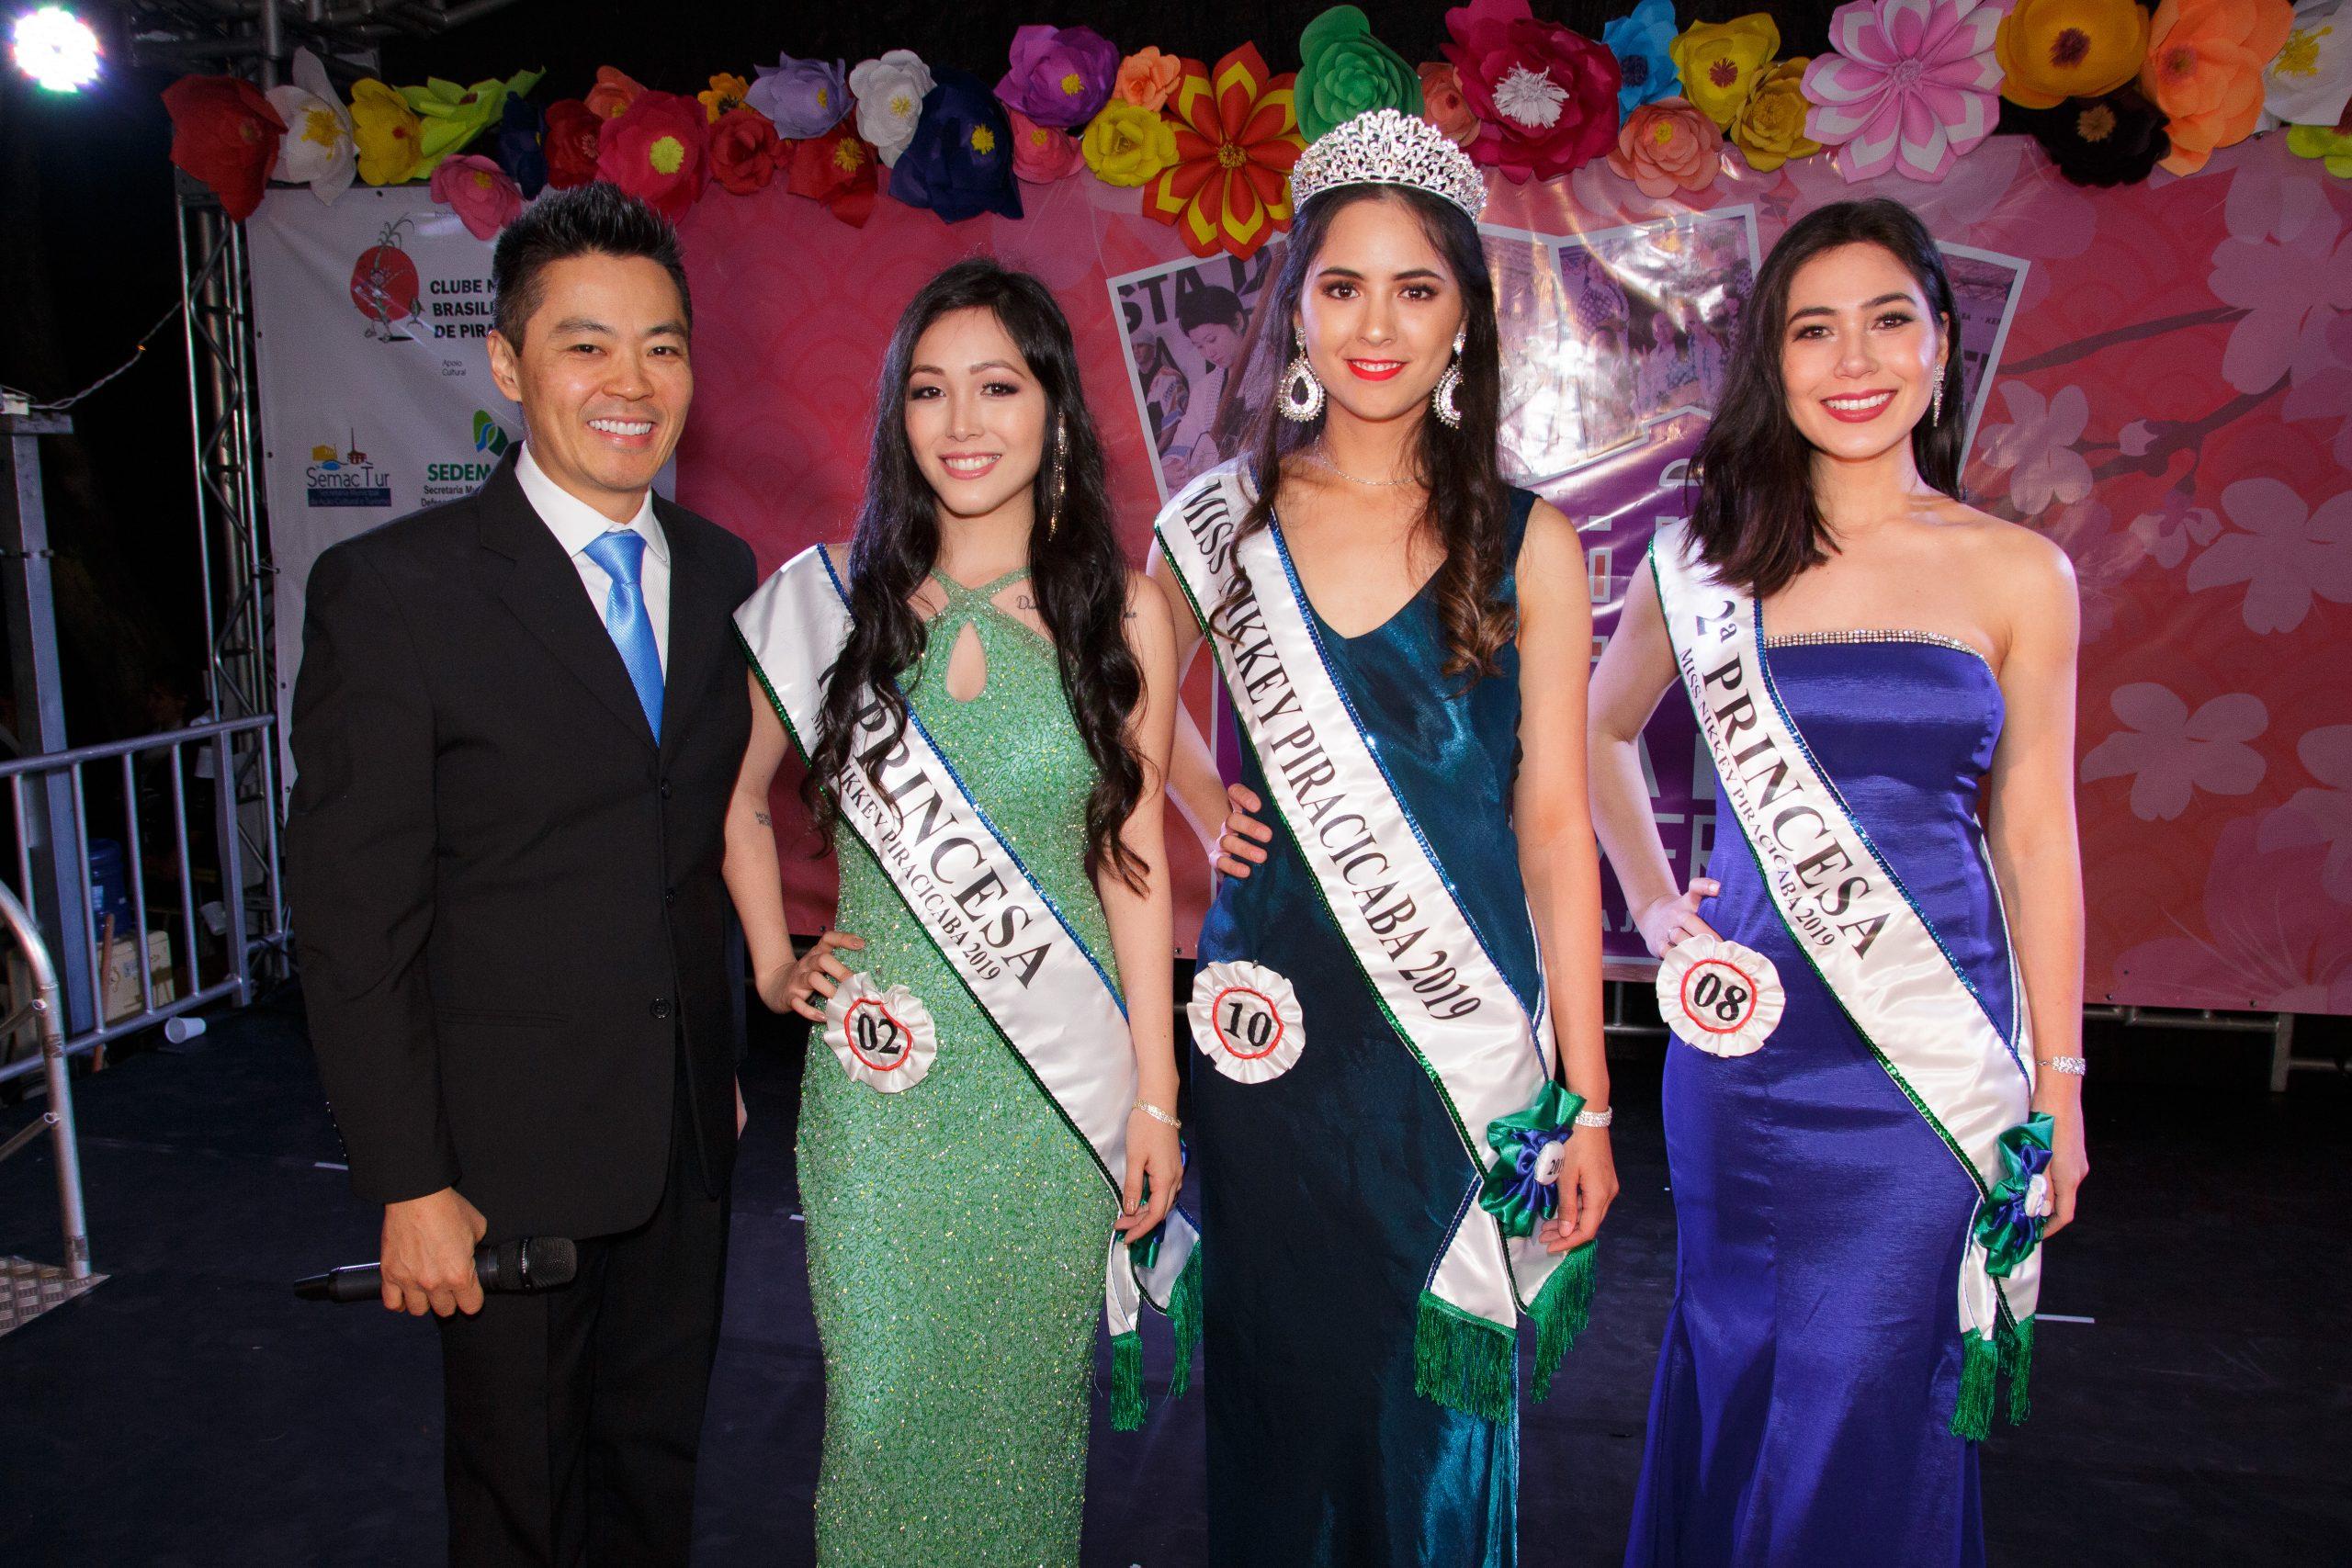 Miss Nikkey Piracicaba 2019